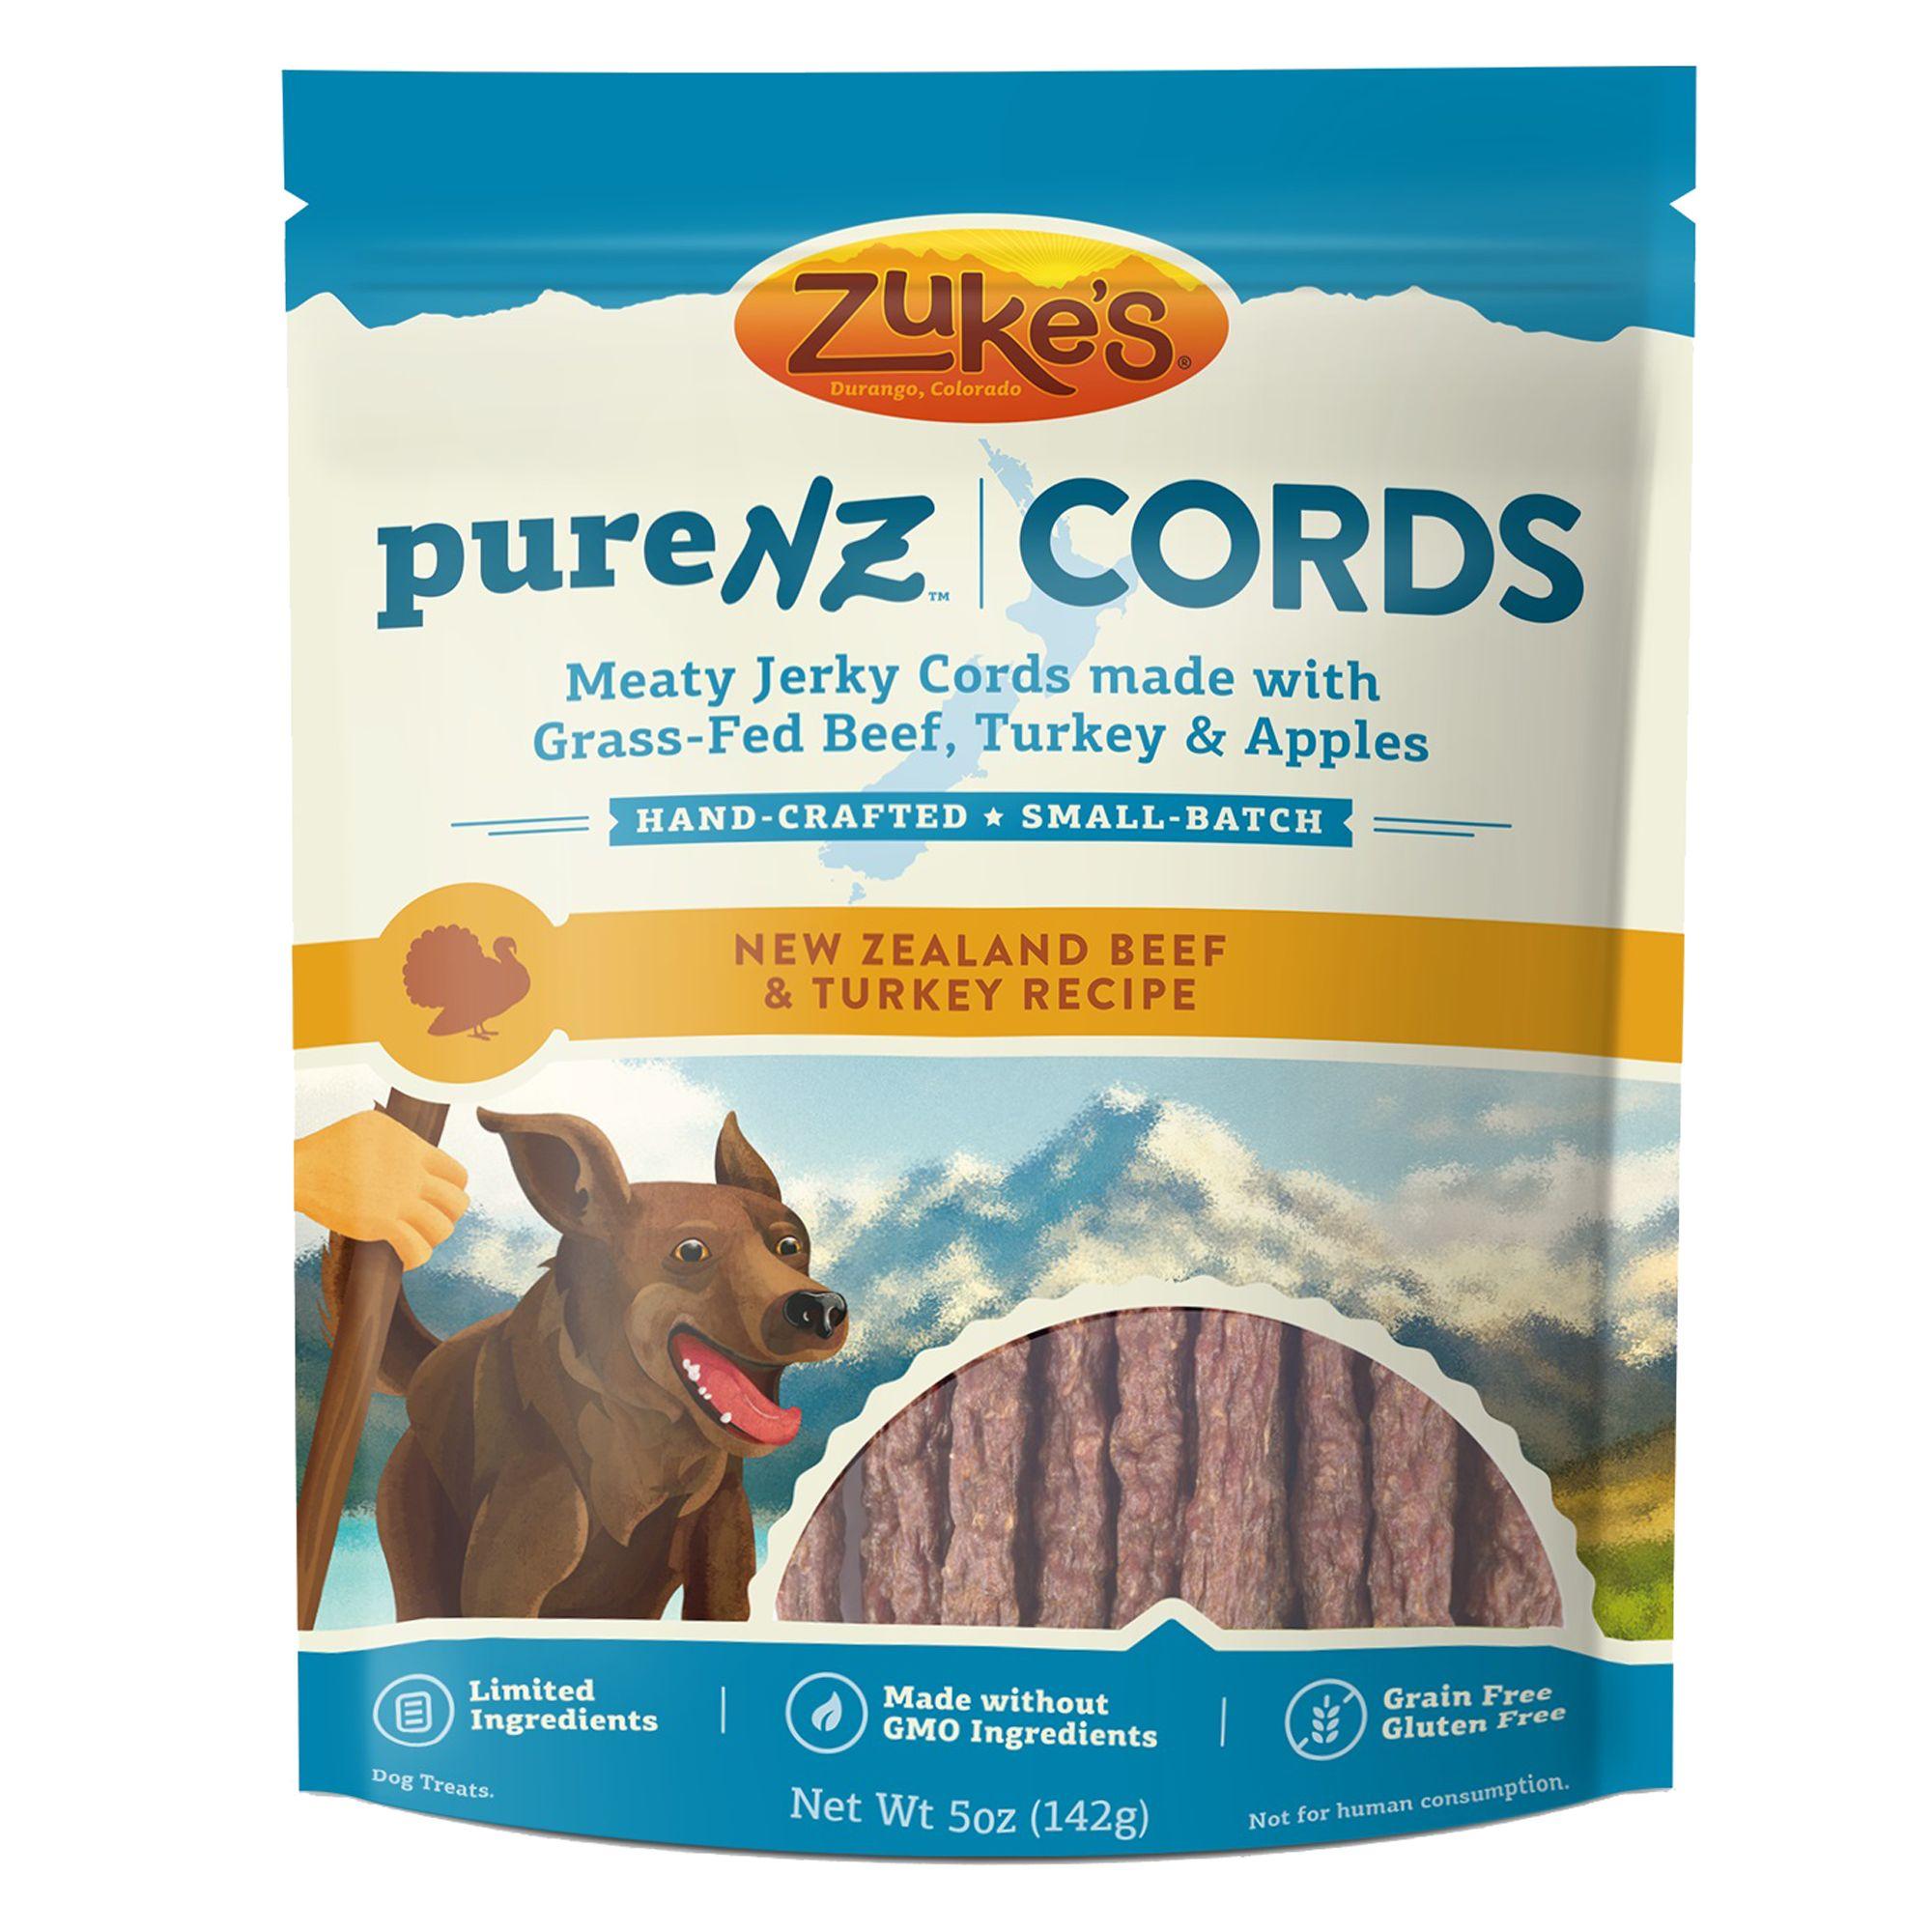 Zuke's® Pure NZ Cords Dog Treat - Grain Free, Limited In